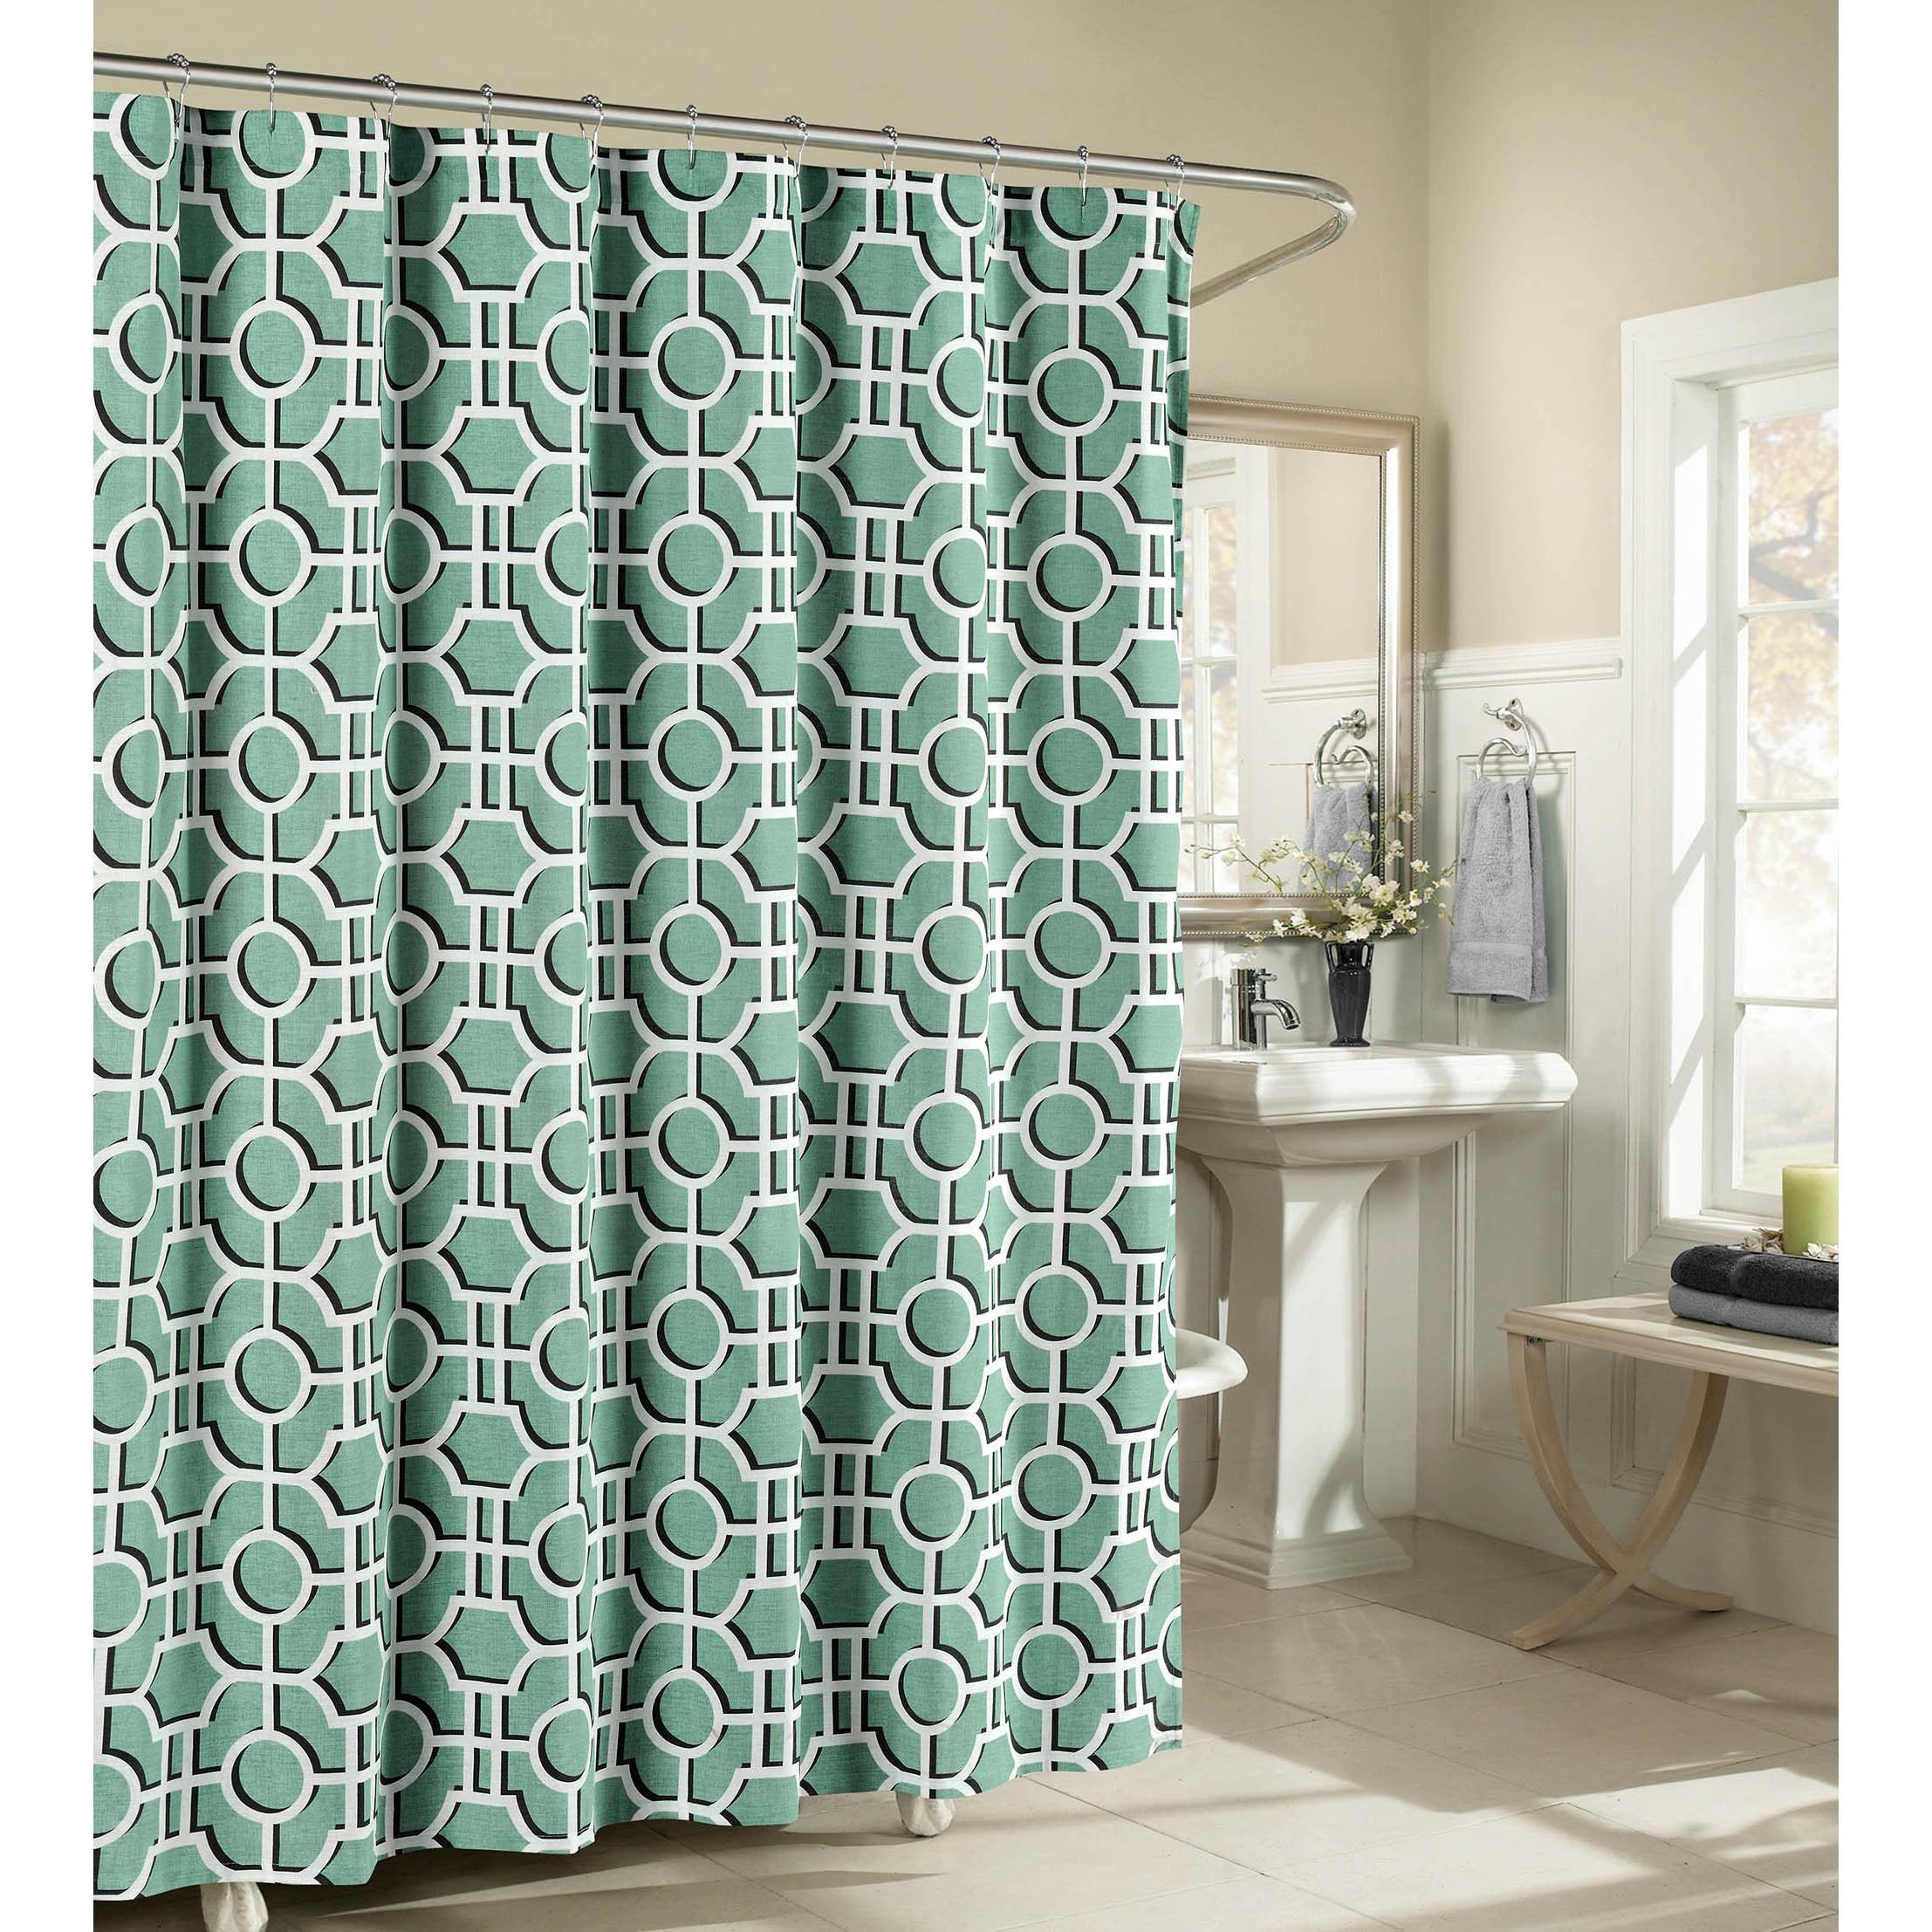 Creative Home Ideas Lenox 100 Cotton Luxury Fabric Shower Curtain